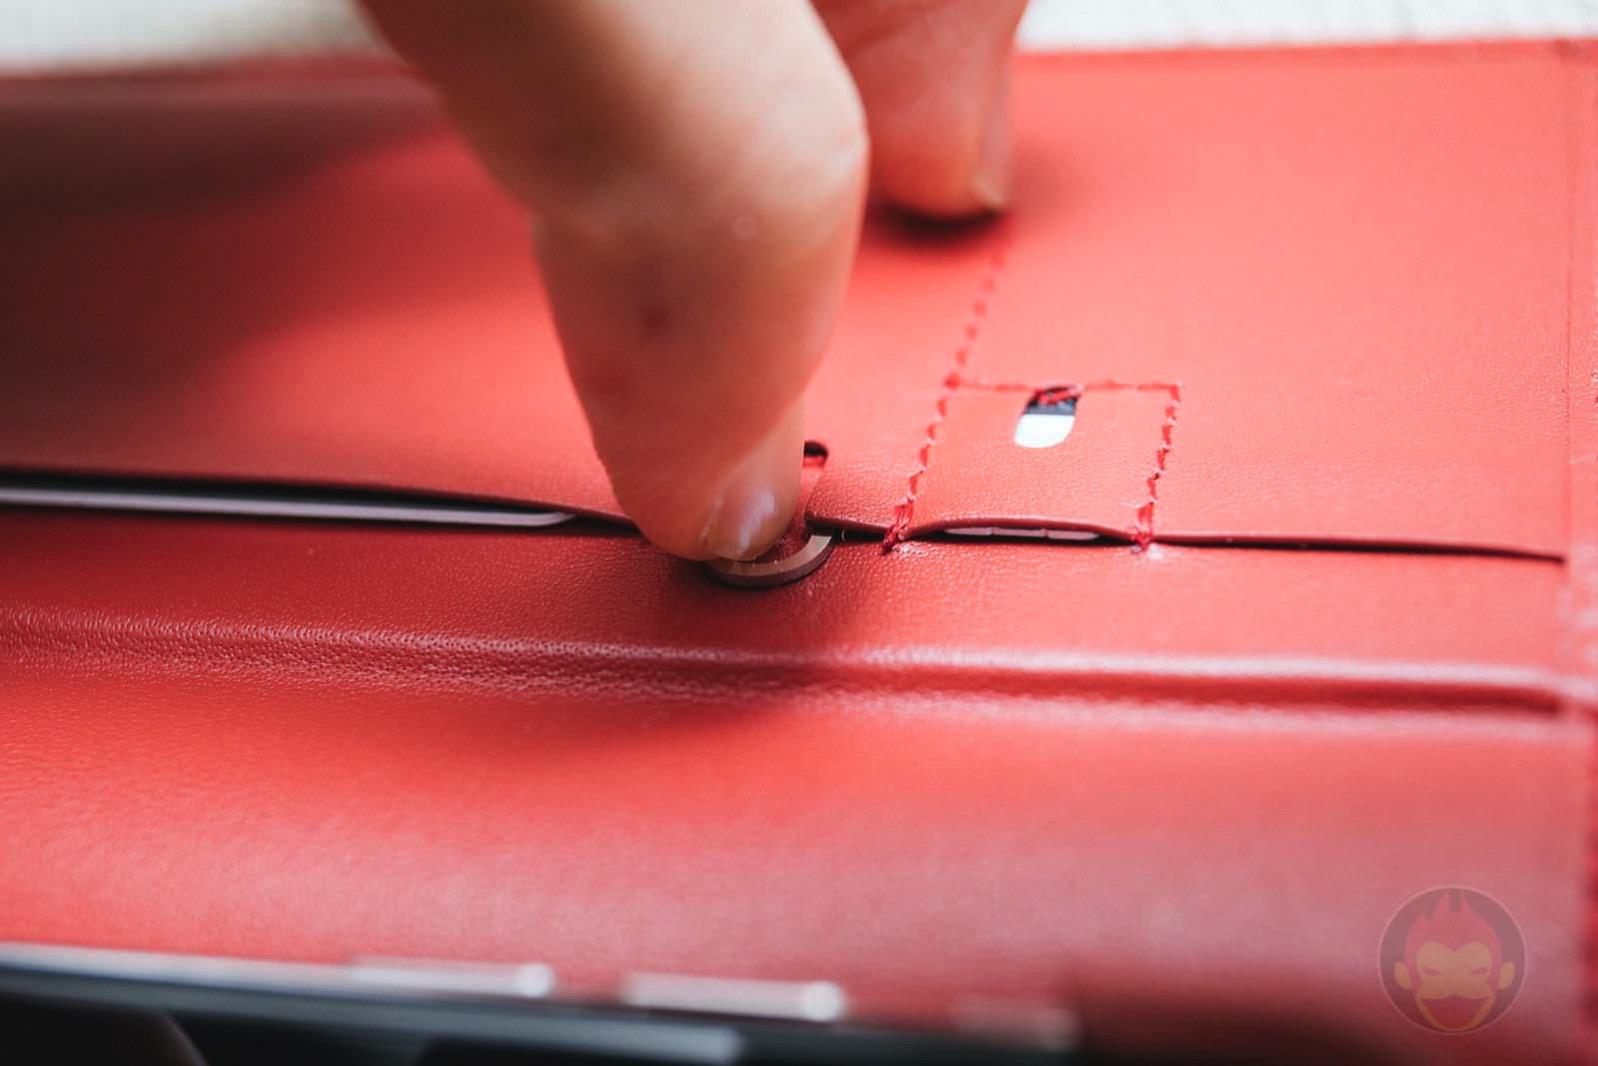 GRAMAS-Full-Leather-Case-Red-for-iPhoneX-SIM-PIN-13.jpg